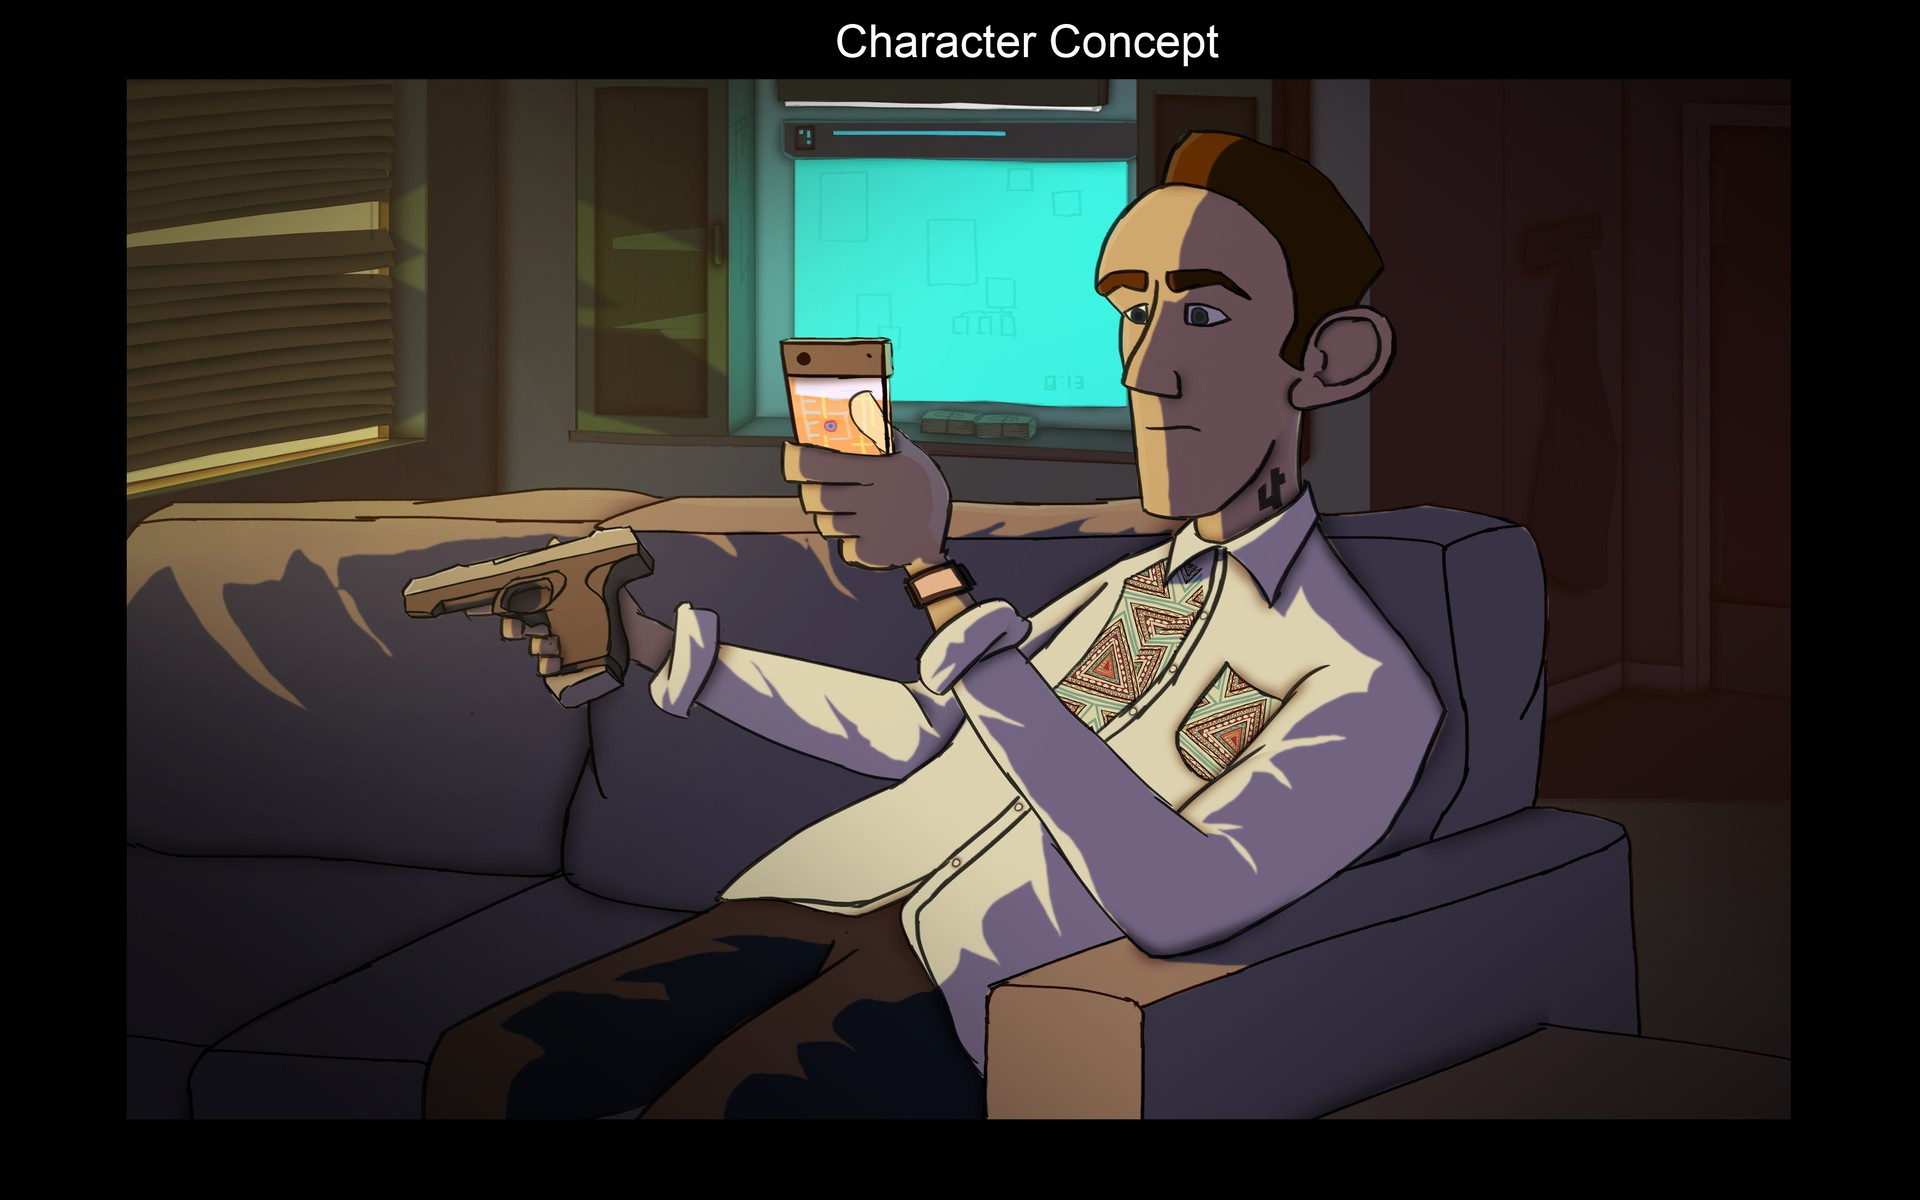 James ray characterconcept